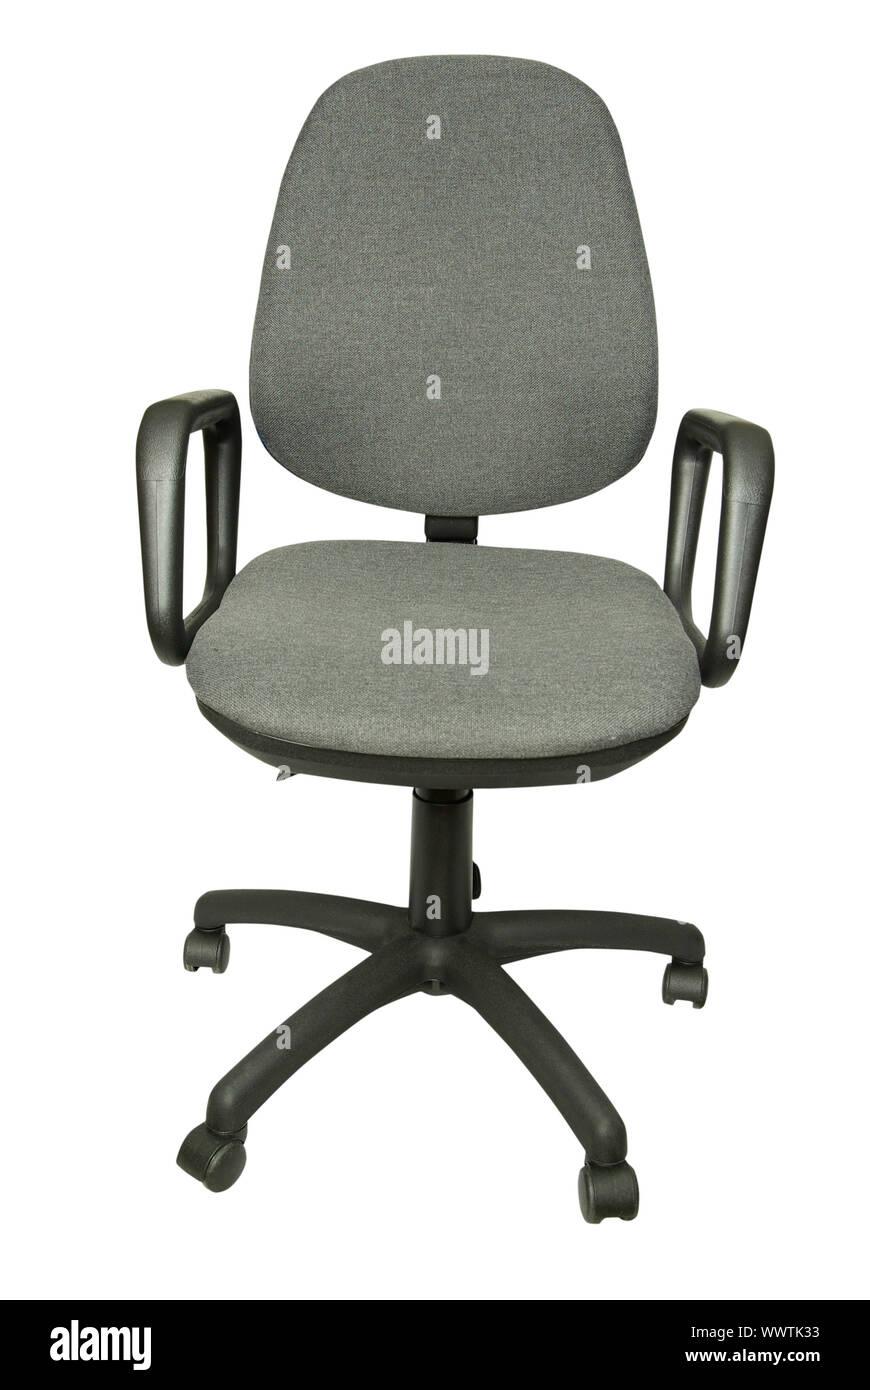 White Upholstered Easy Chair Imágenes De Stock & White ...